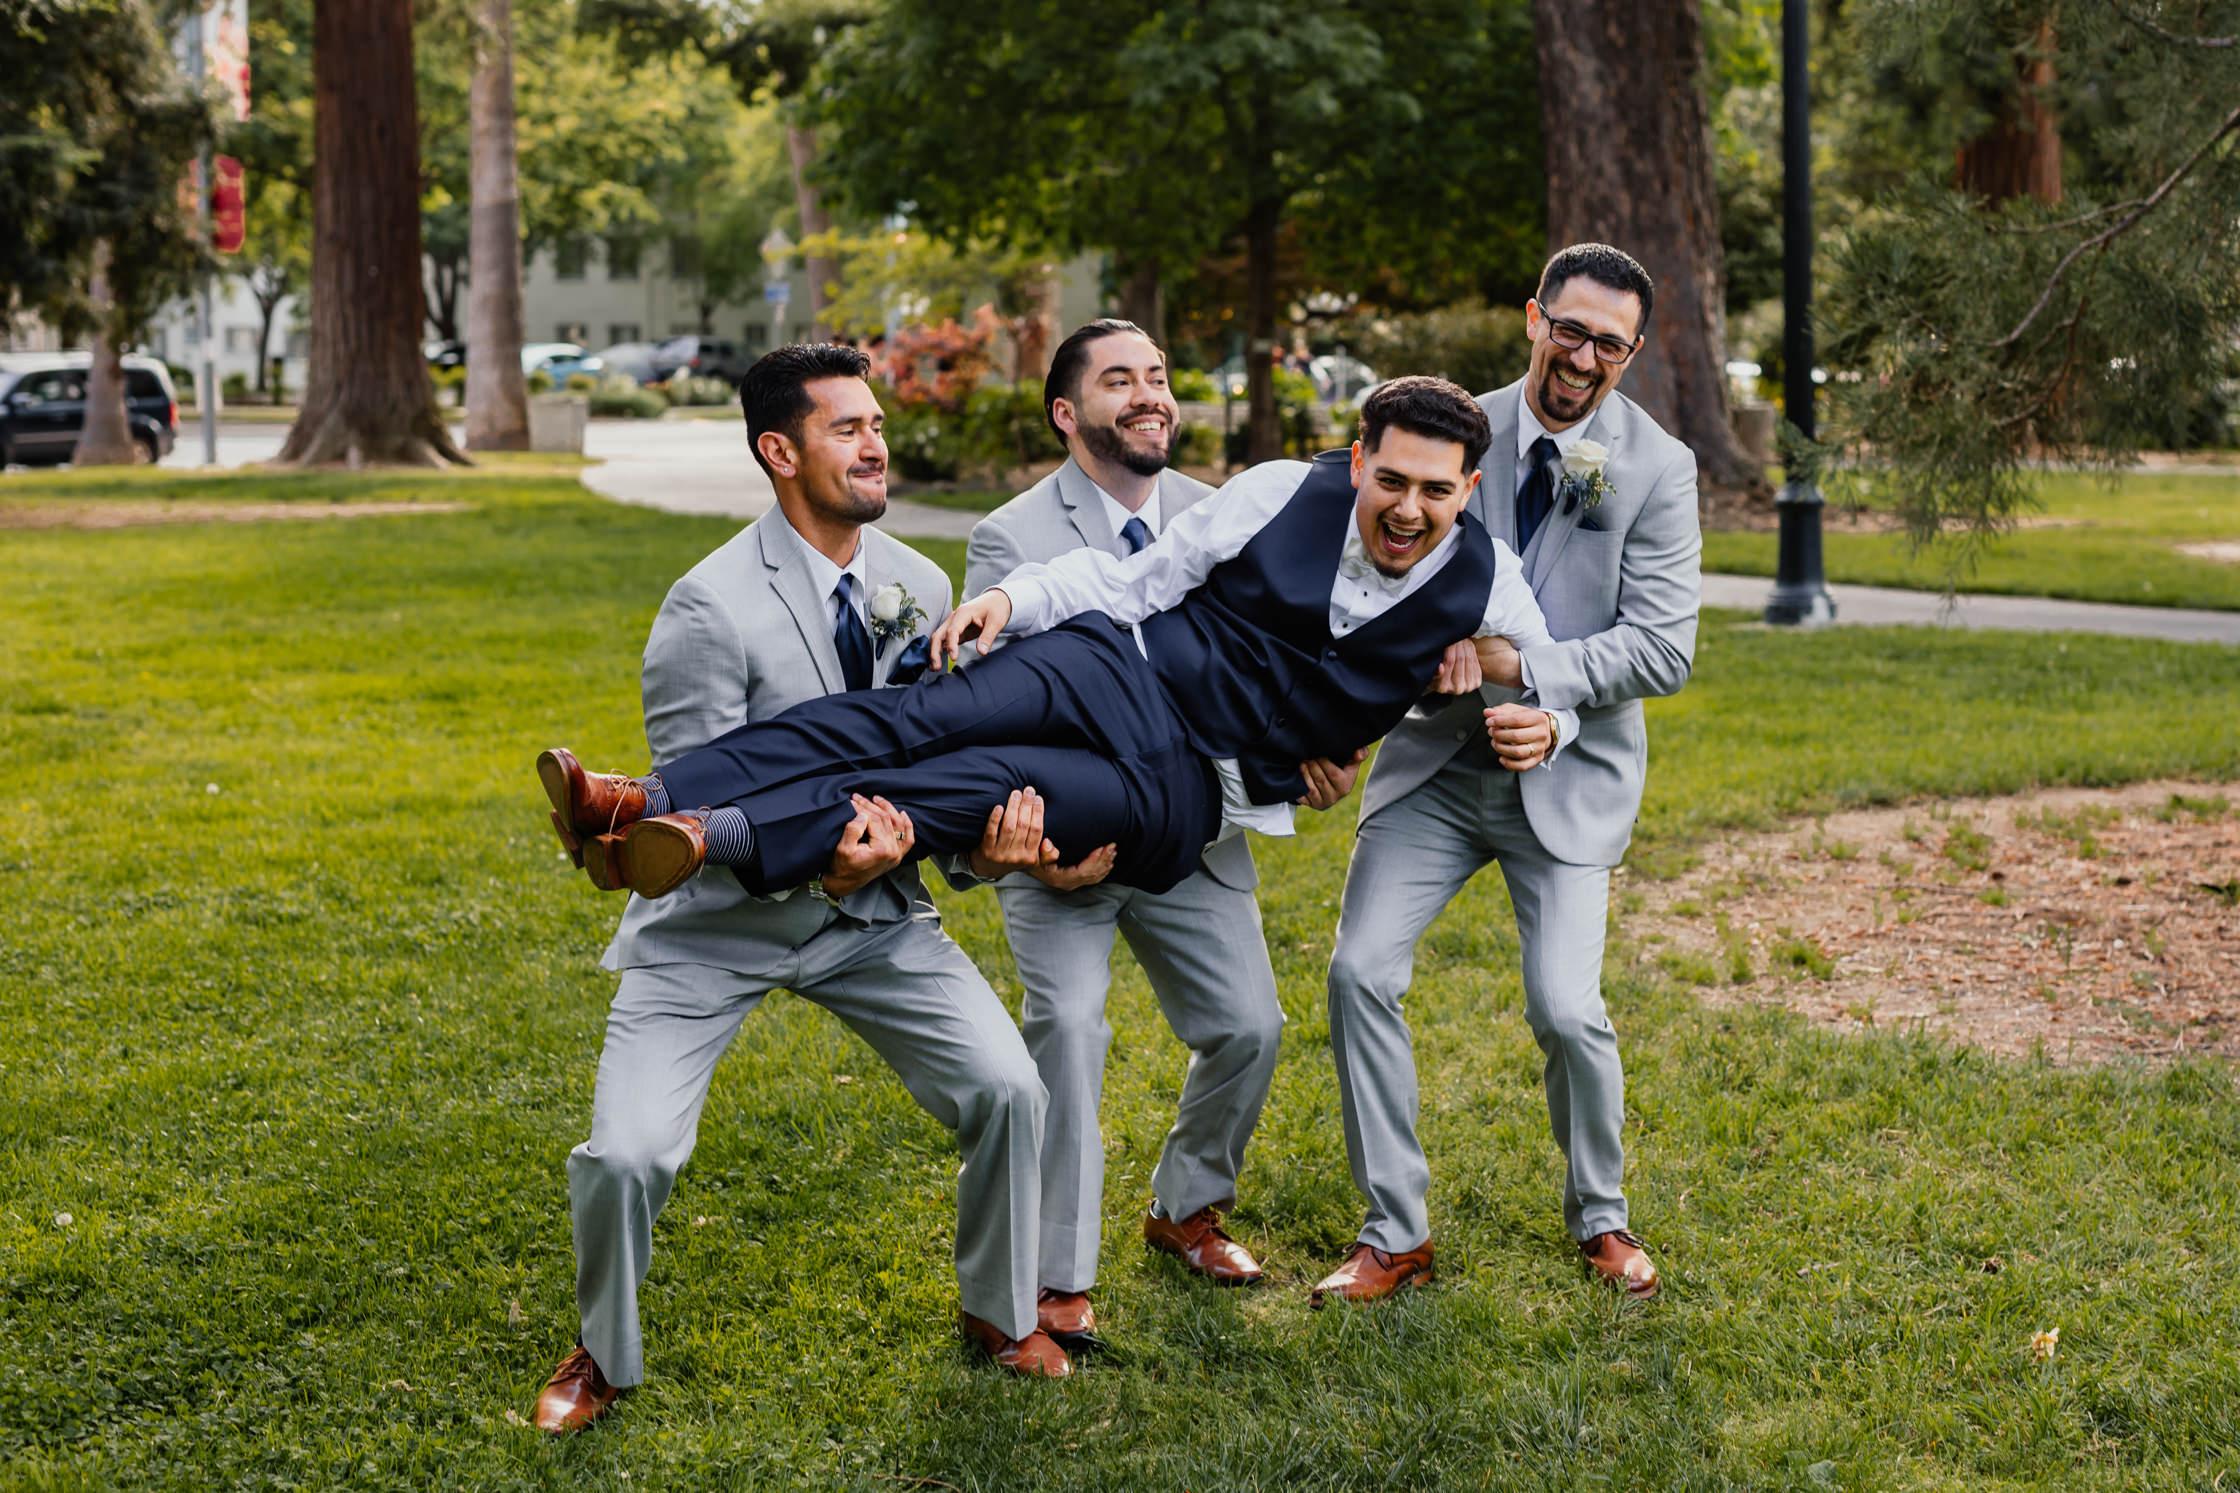 luis_joanna_wedding-55.jpg